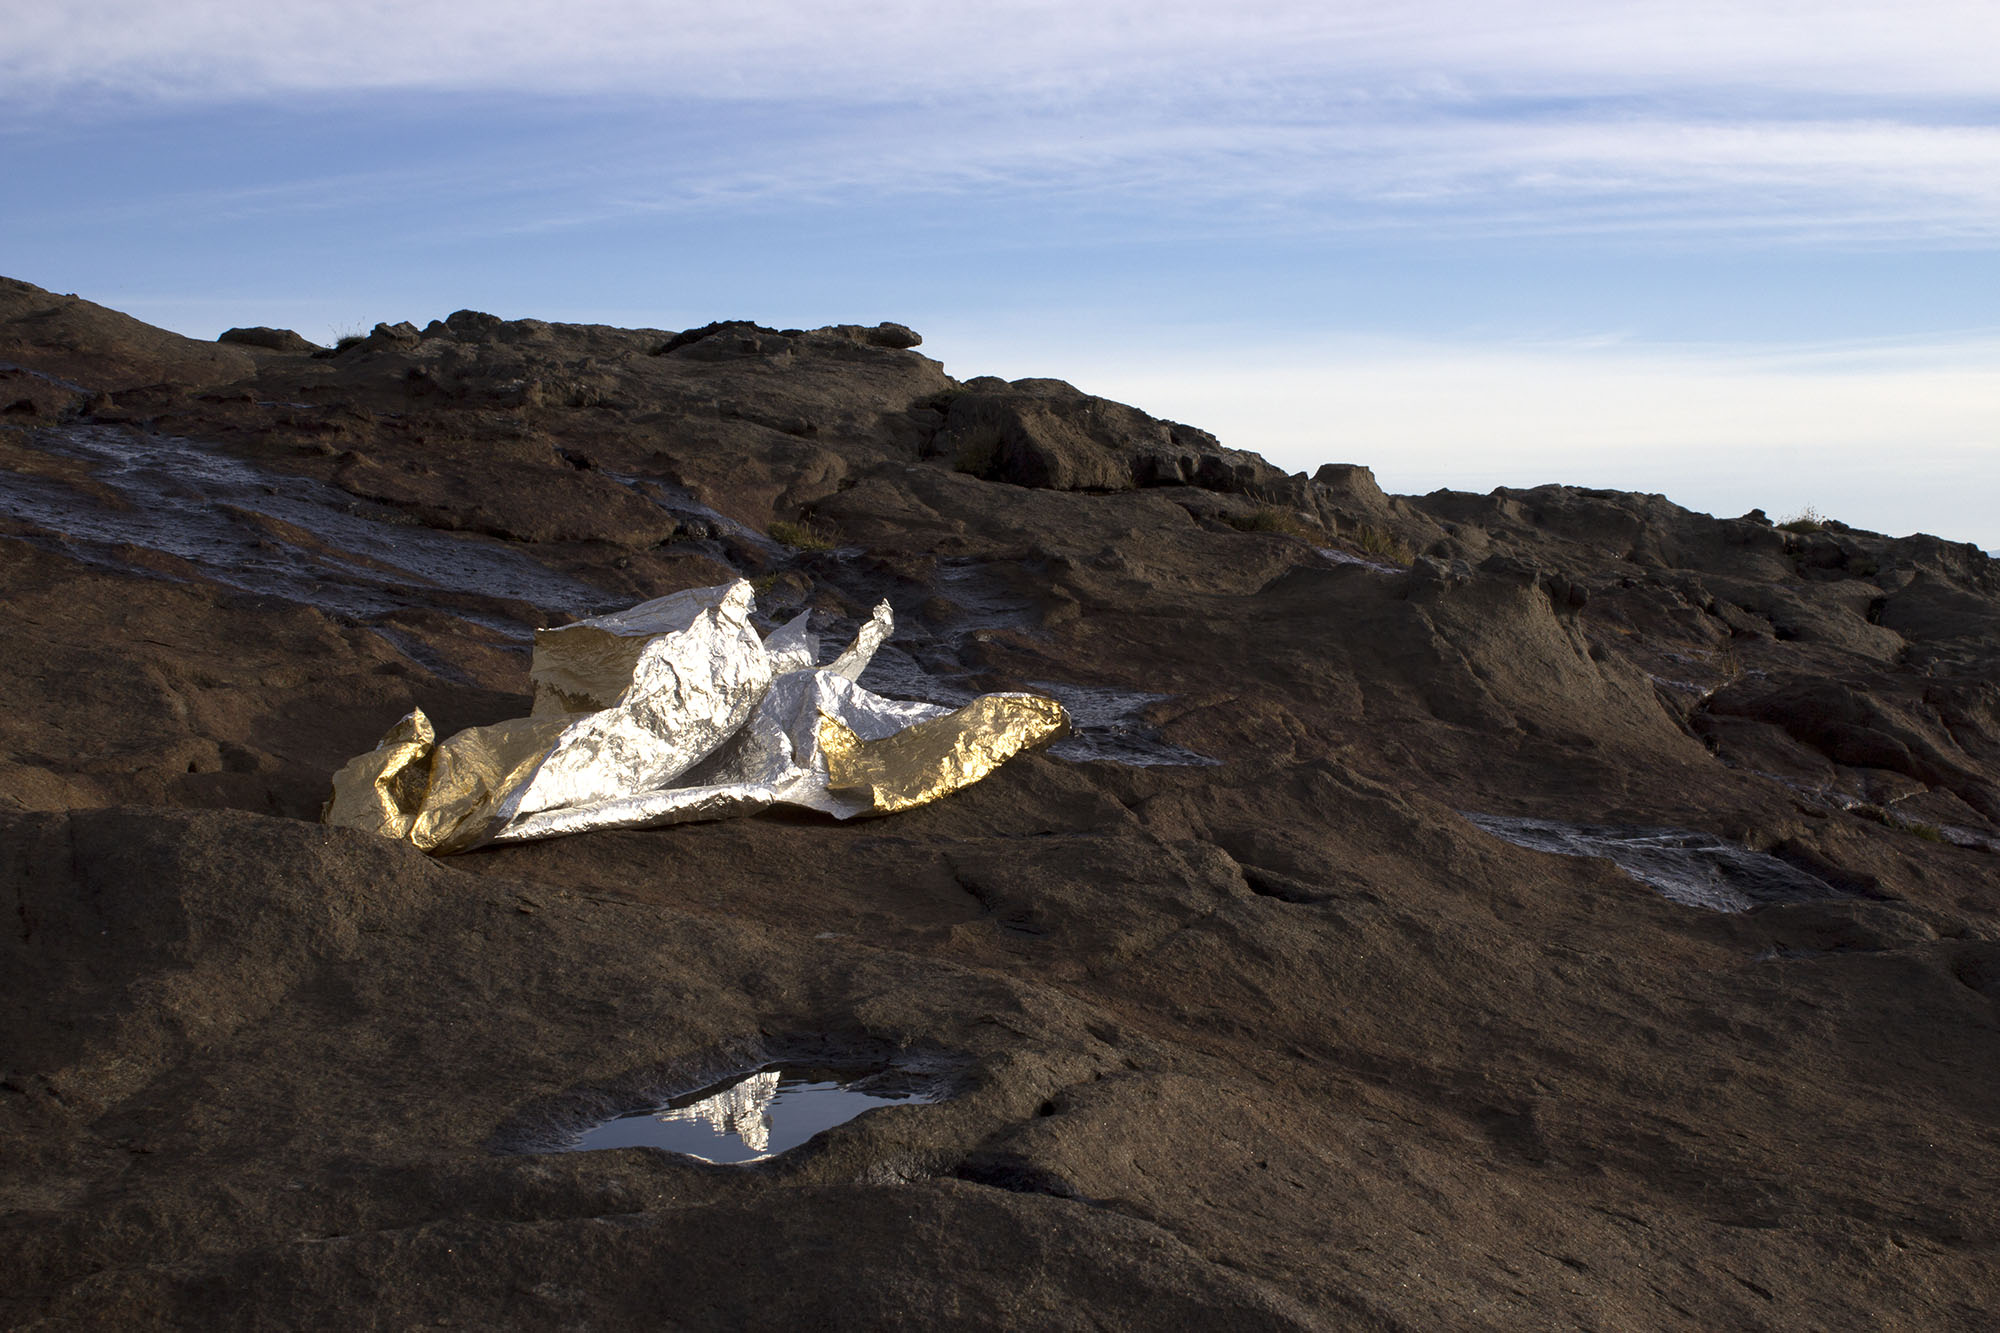 lifting, settling of a mountain  , 2013 foil sheet, natural light, water, wind dimensions variable  Spákonufellshöfði, Skagaströnd, Iceland